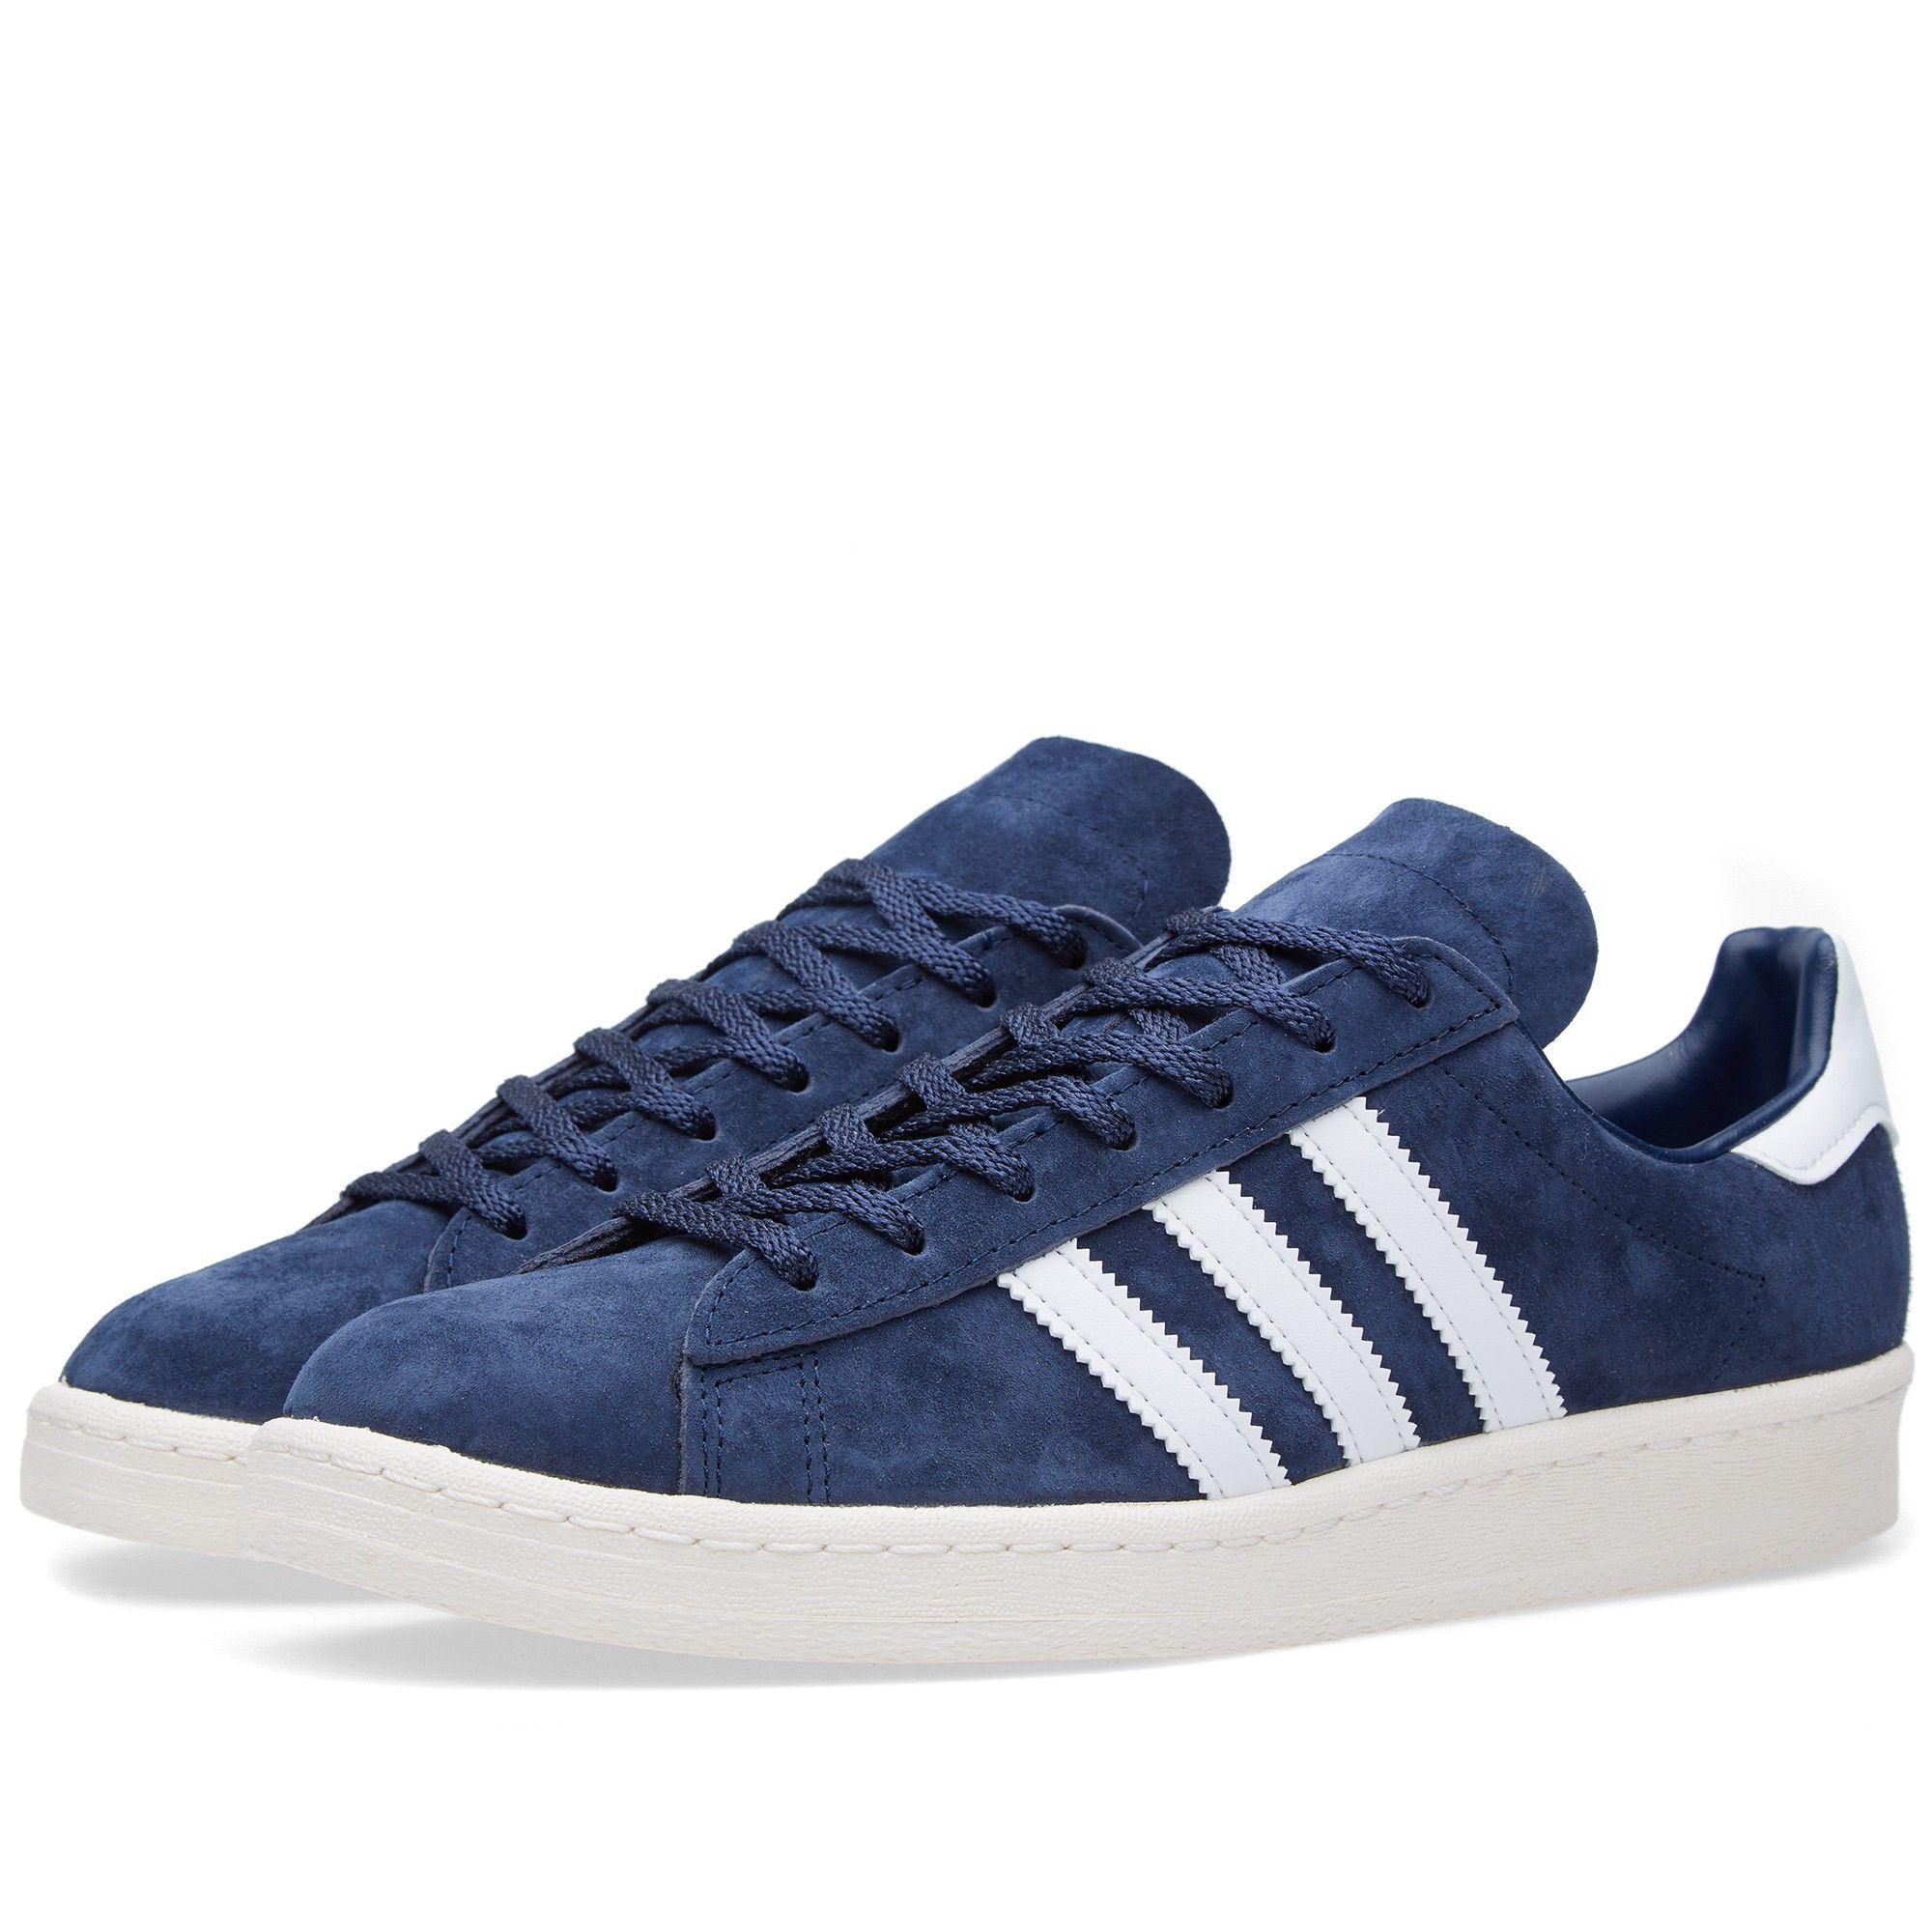 cheap for discount 2e377 731eb Adidas Campus 80s Vintage Japan (Dark Blue   Off White)